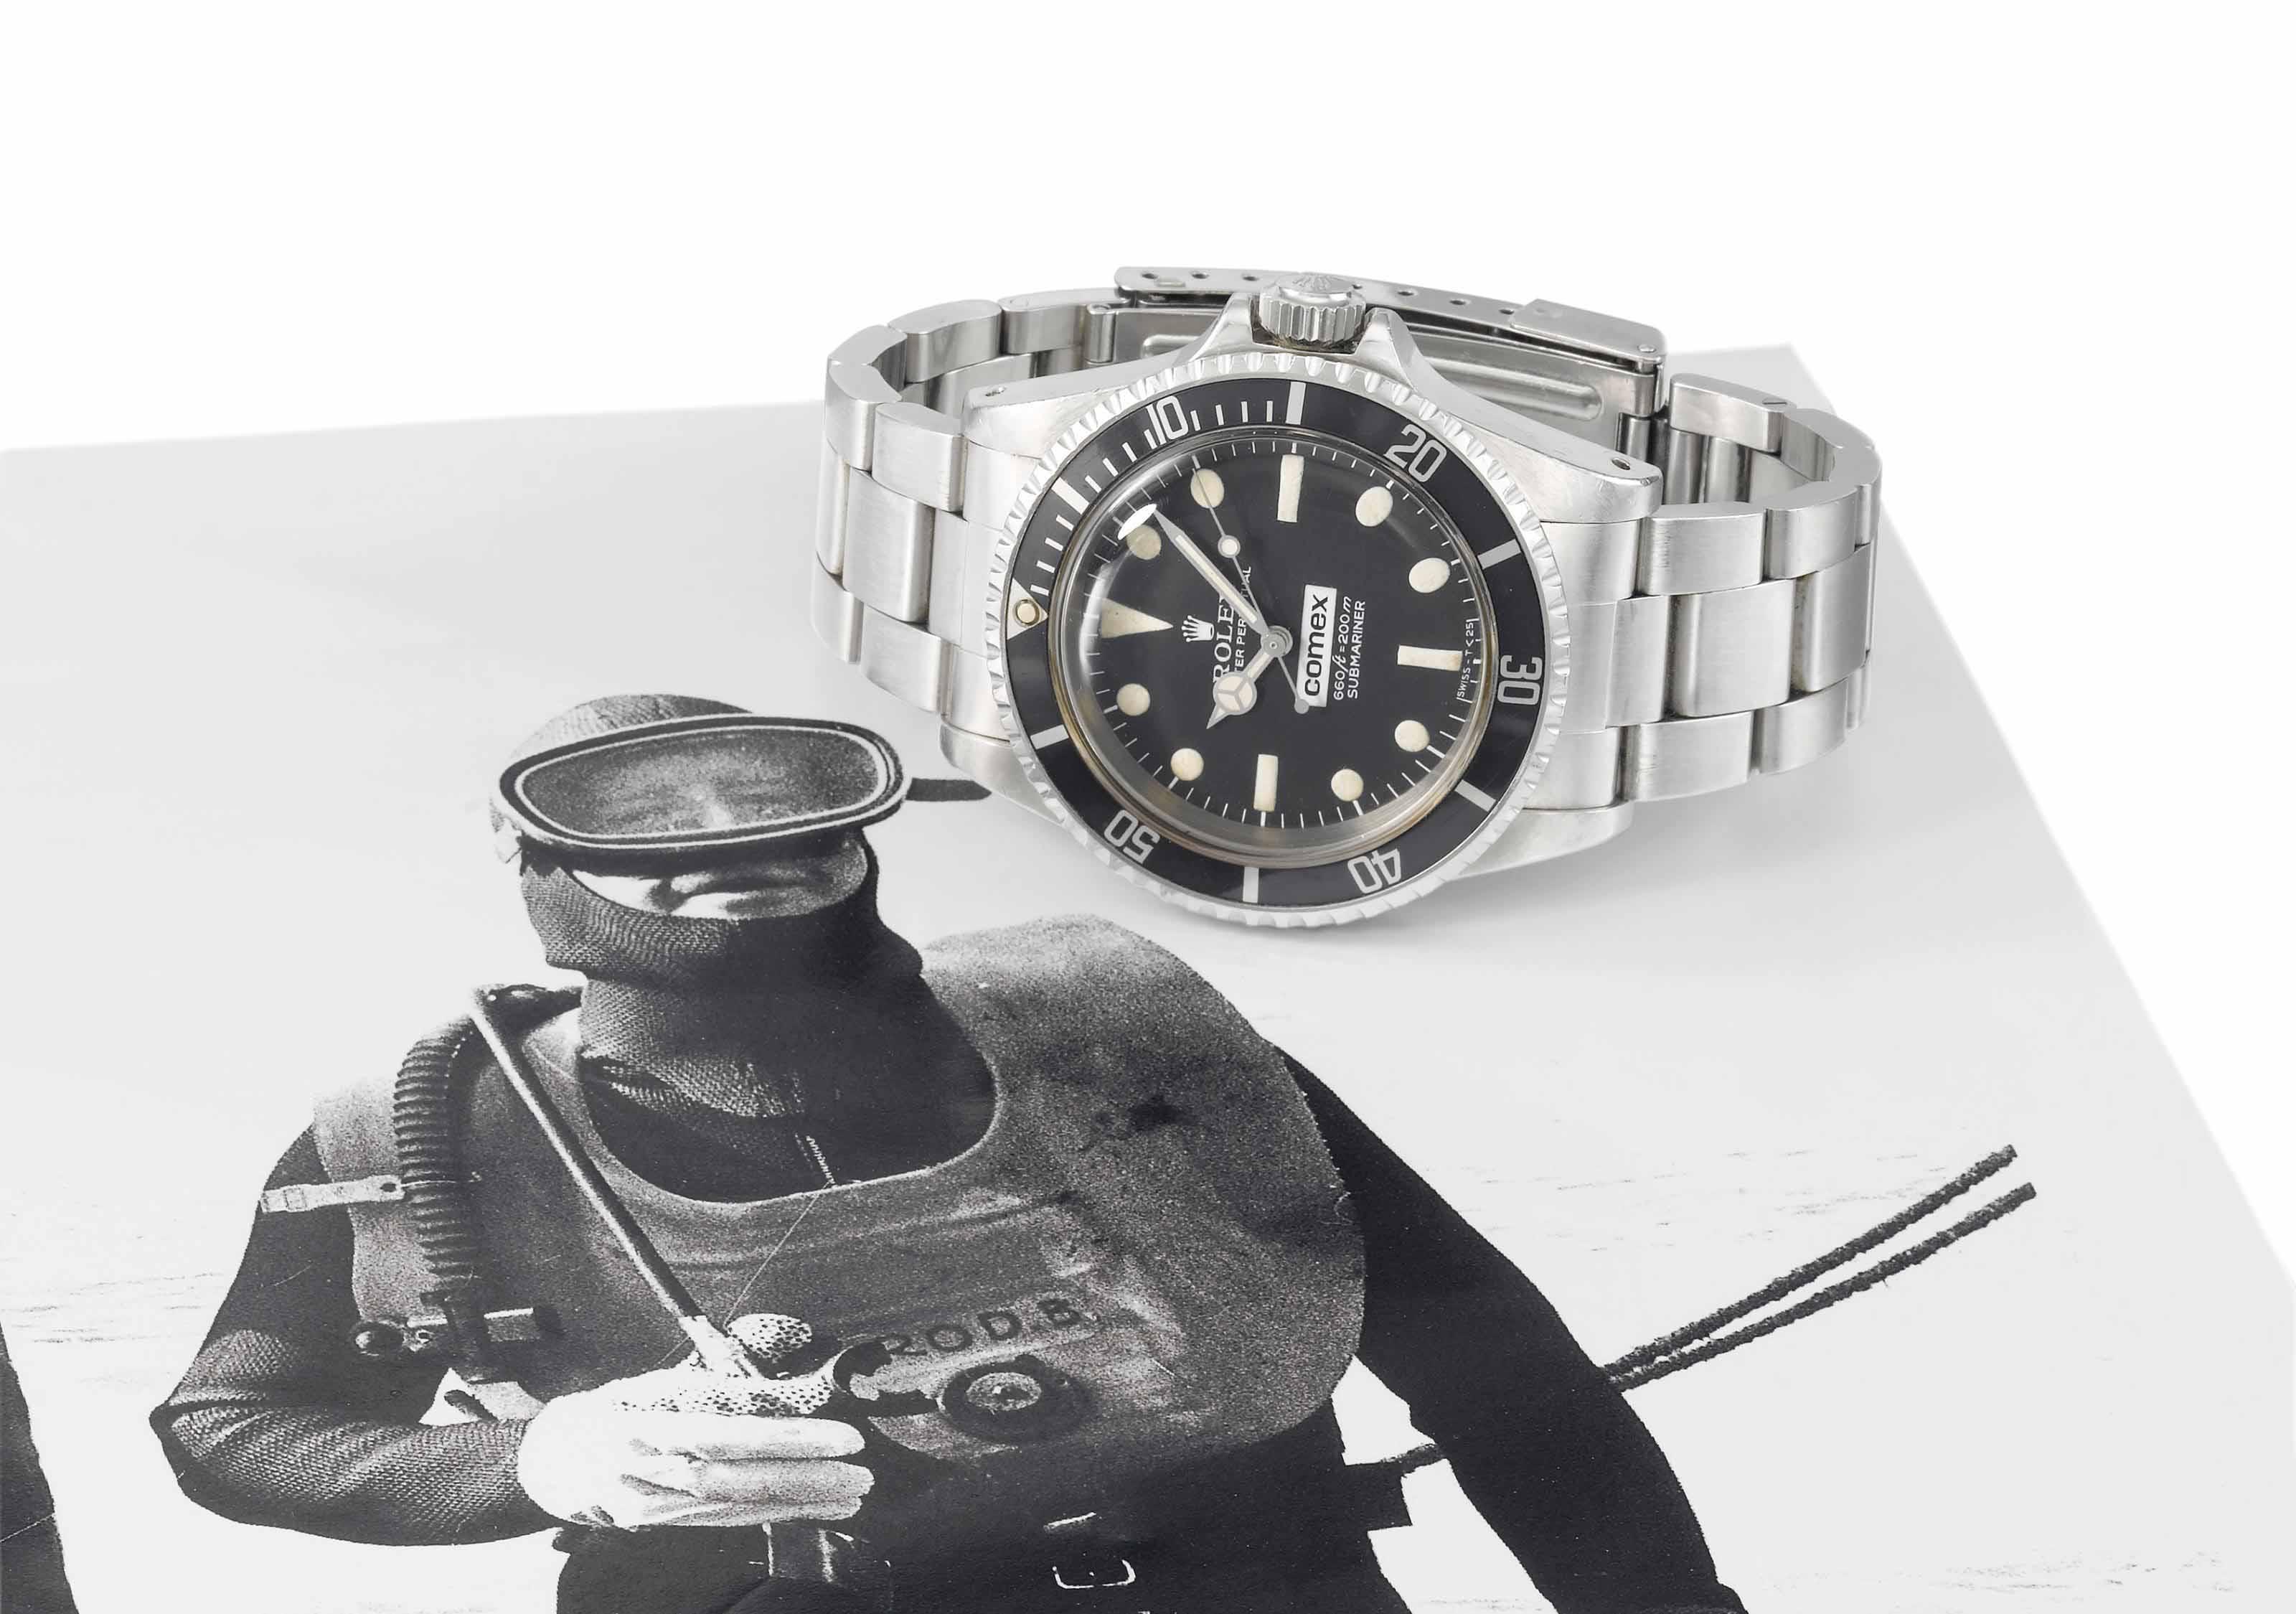 Rolex, made for Comex. A very